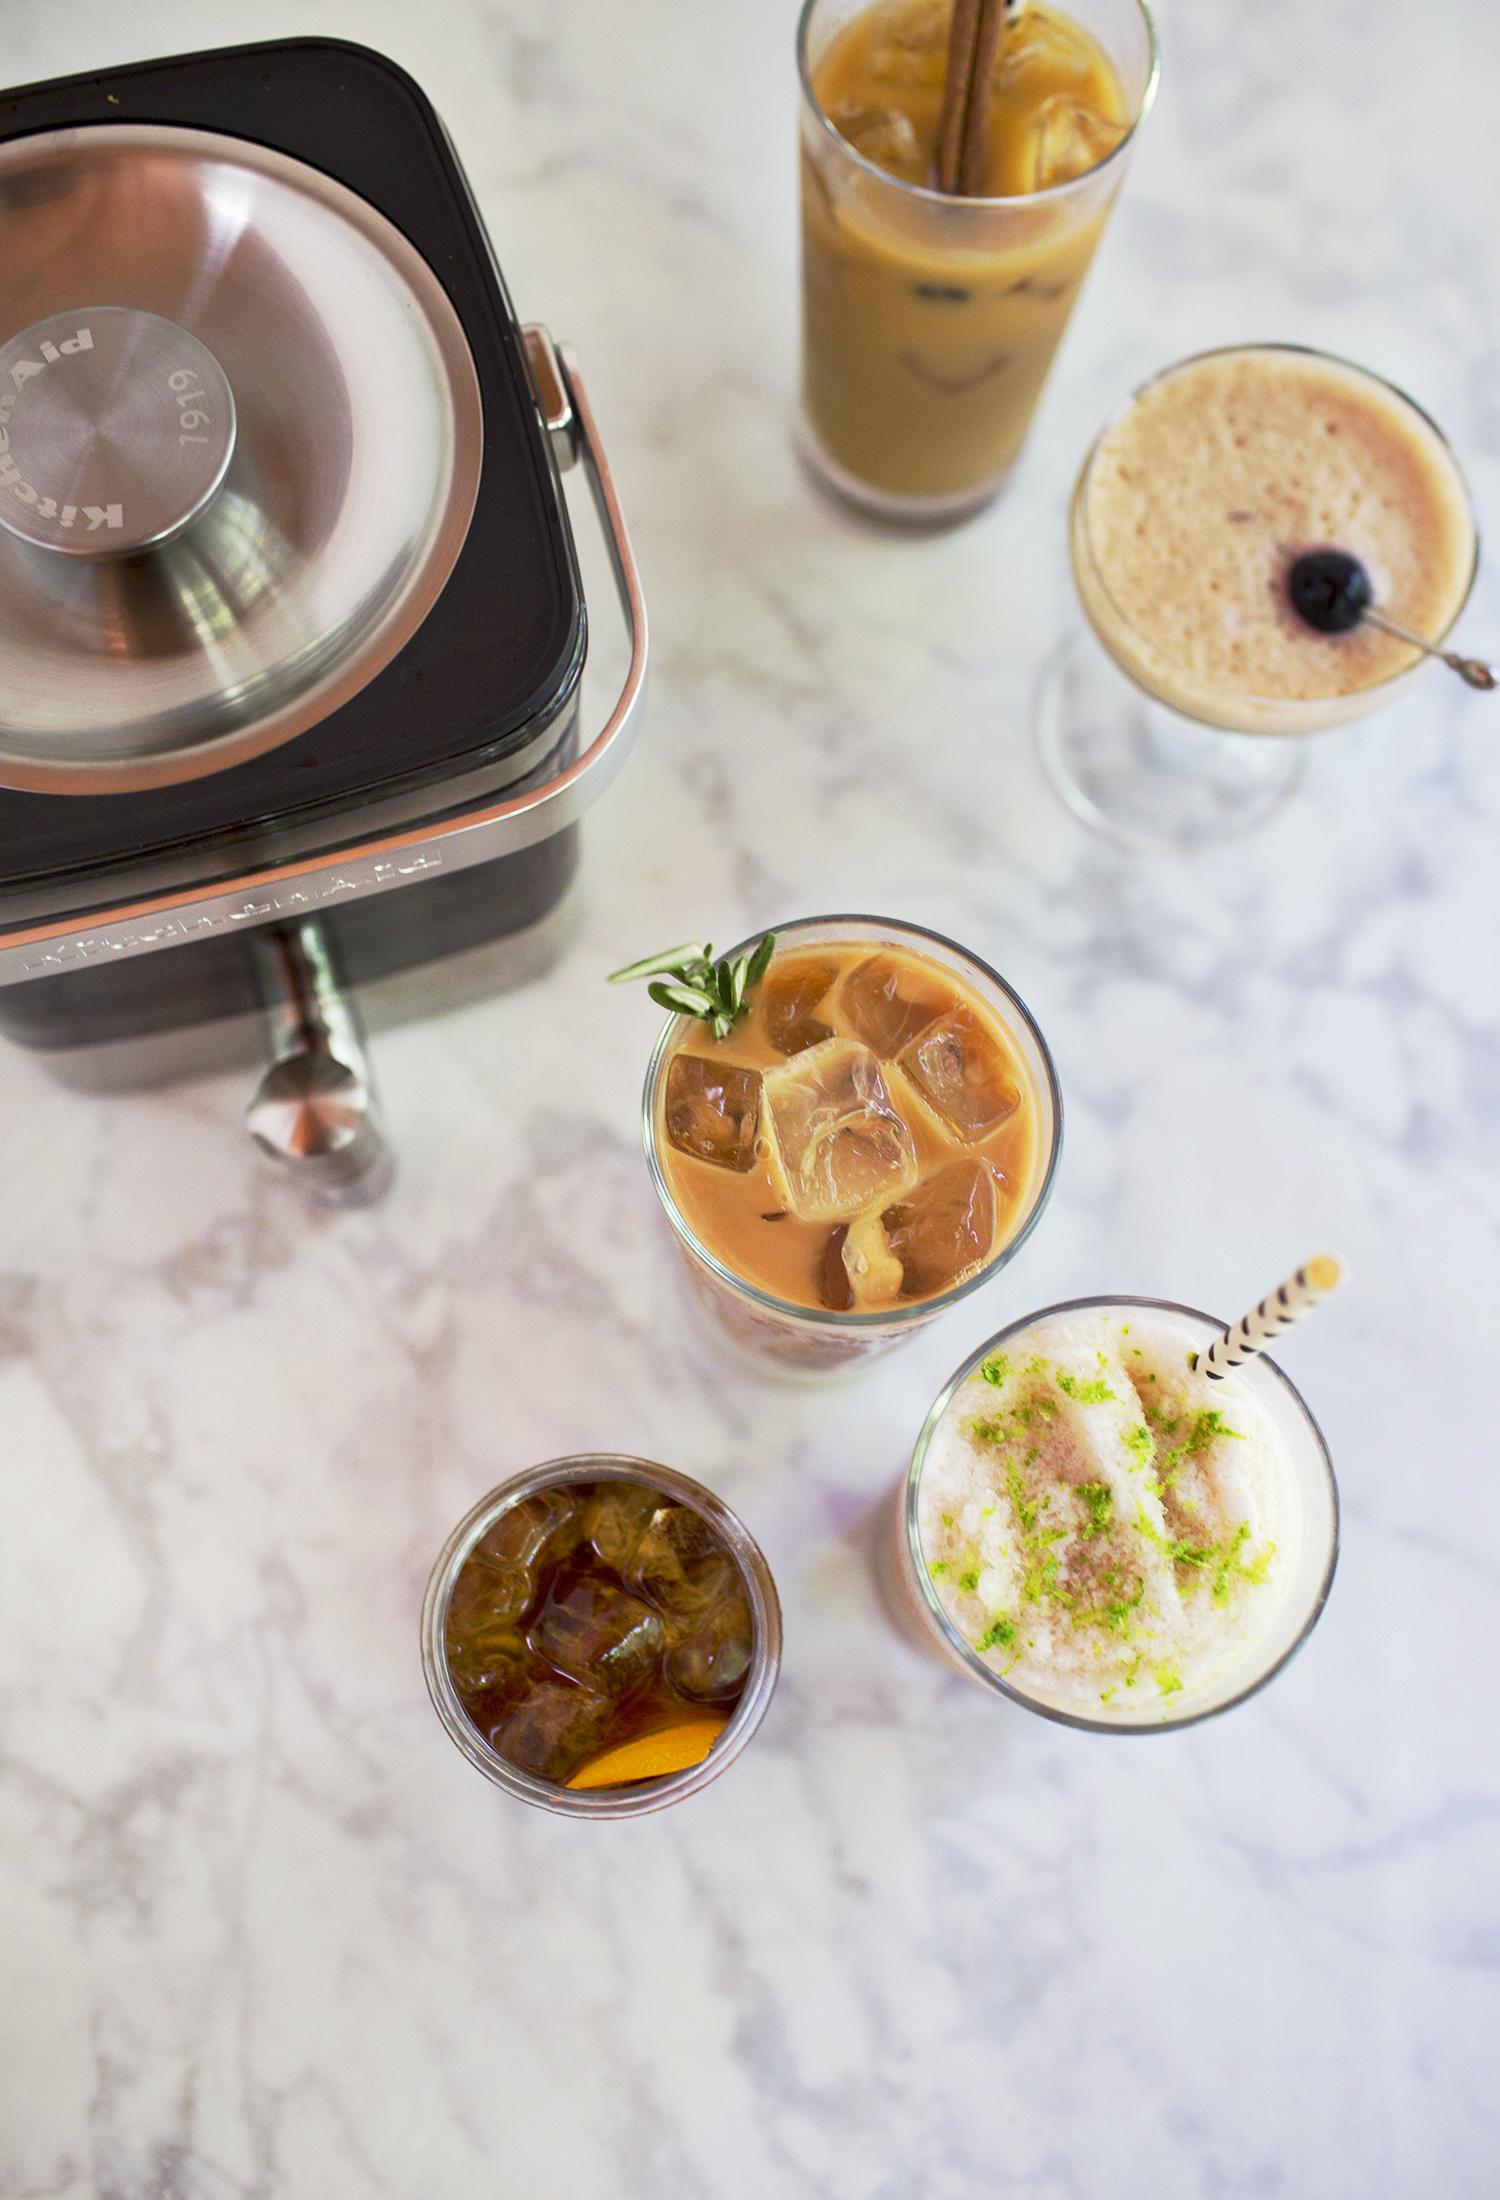 5 Simple Iced Coffee recipies